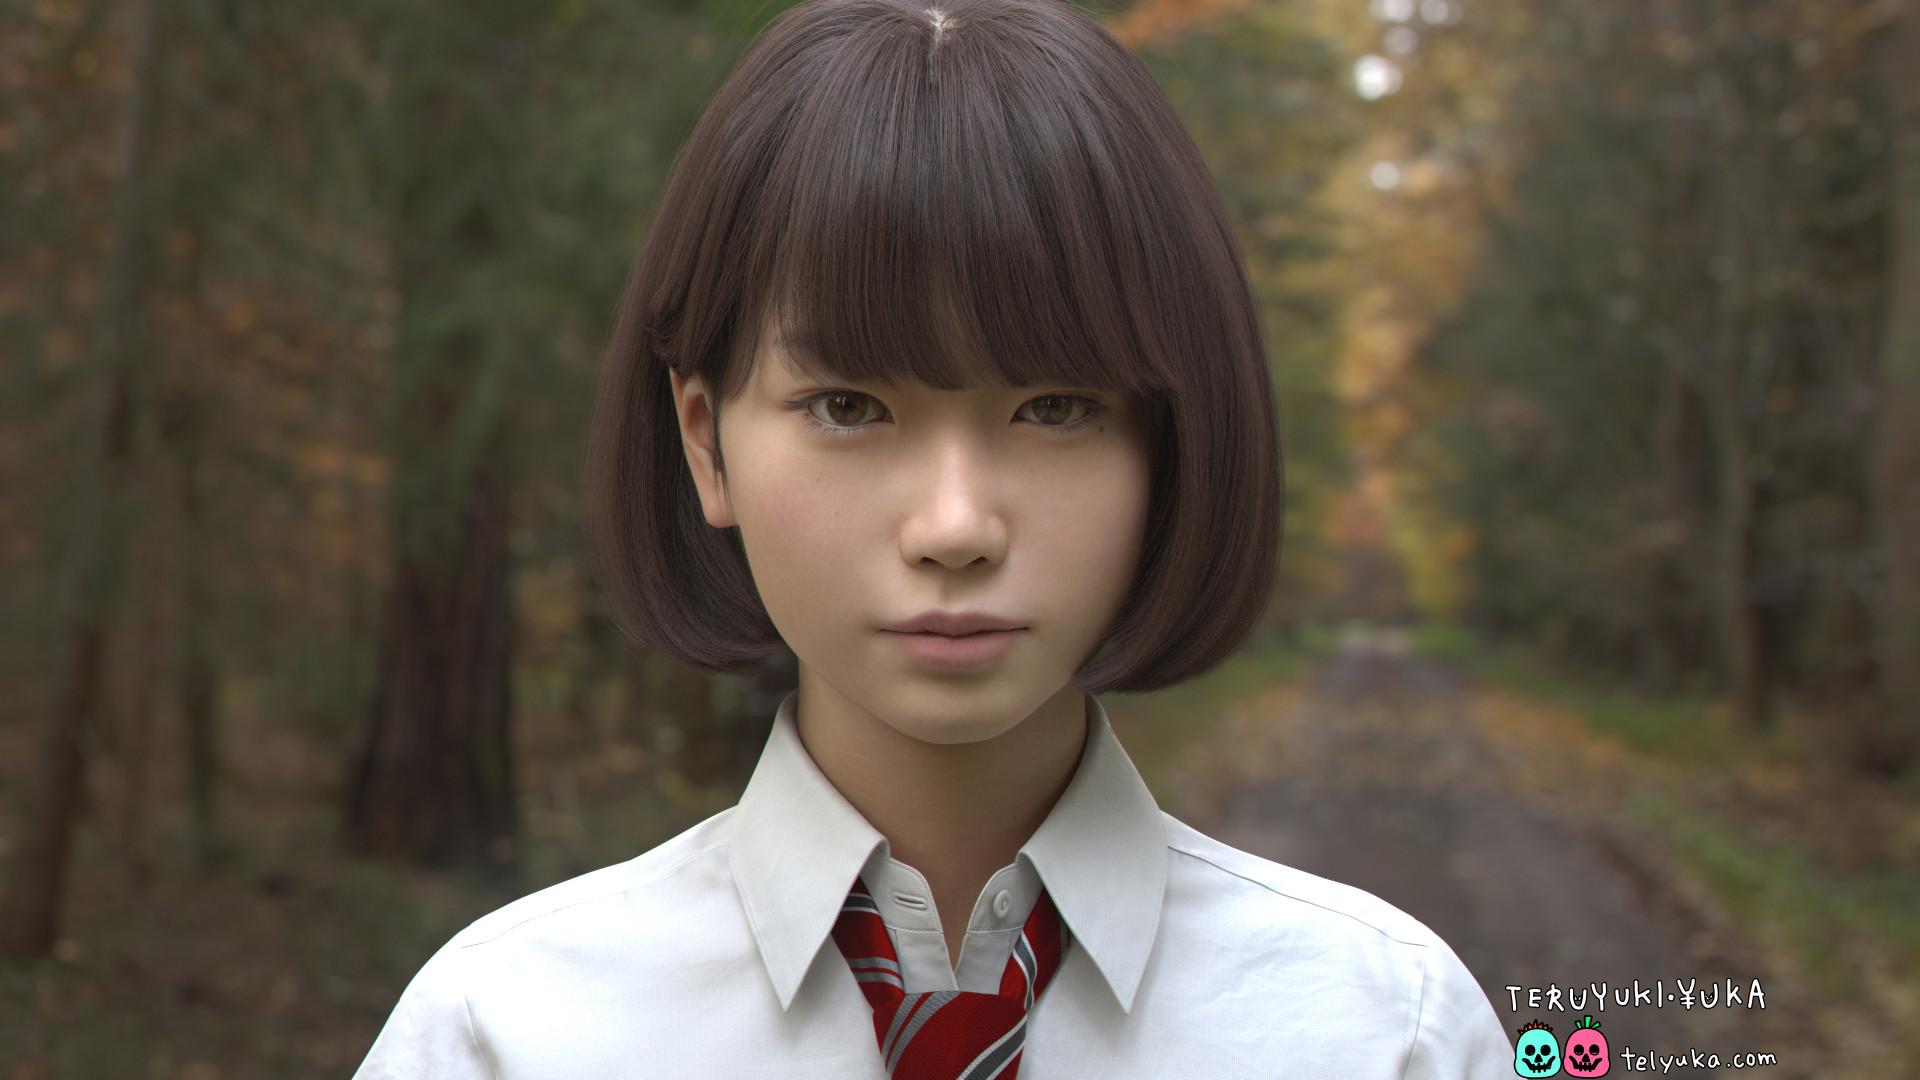 Teruyuki and yuka saya wip render 002